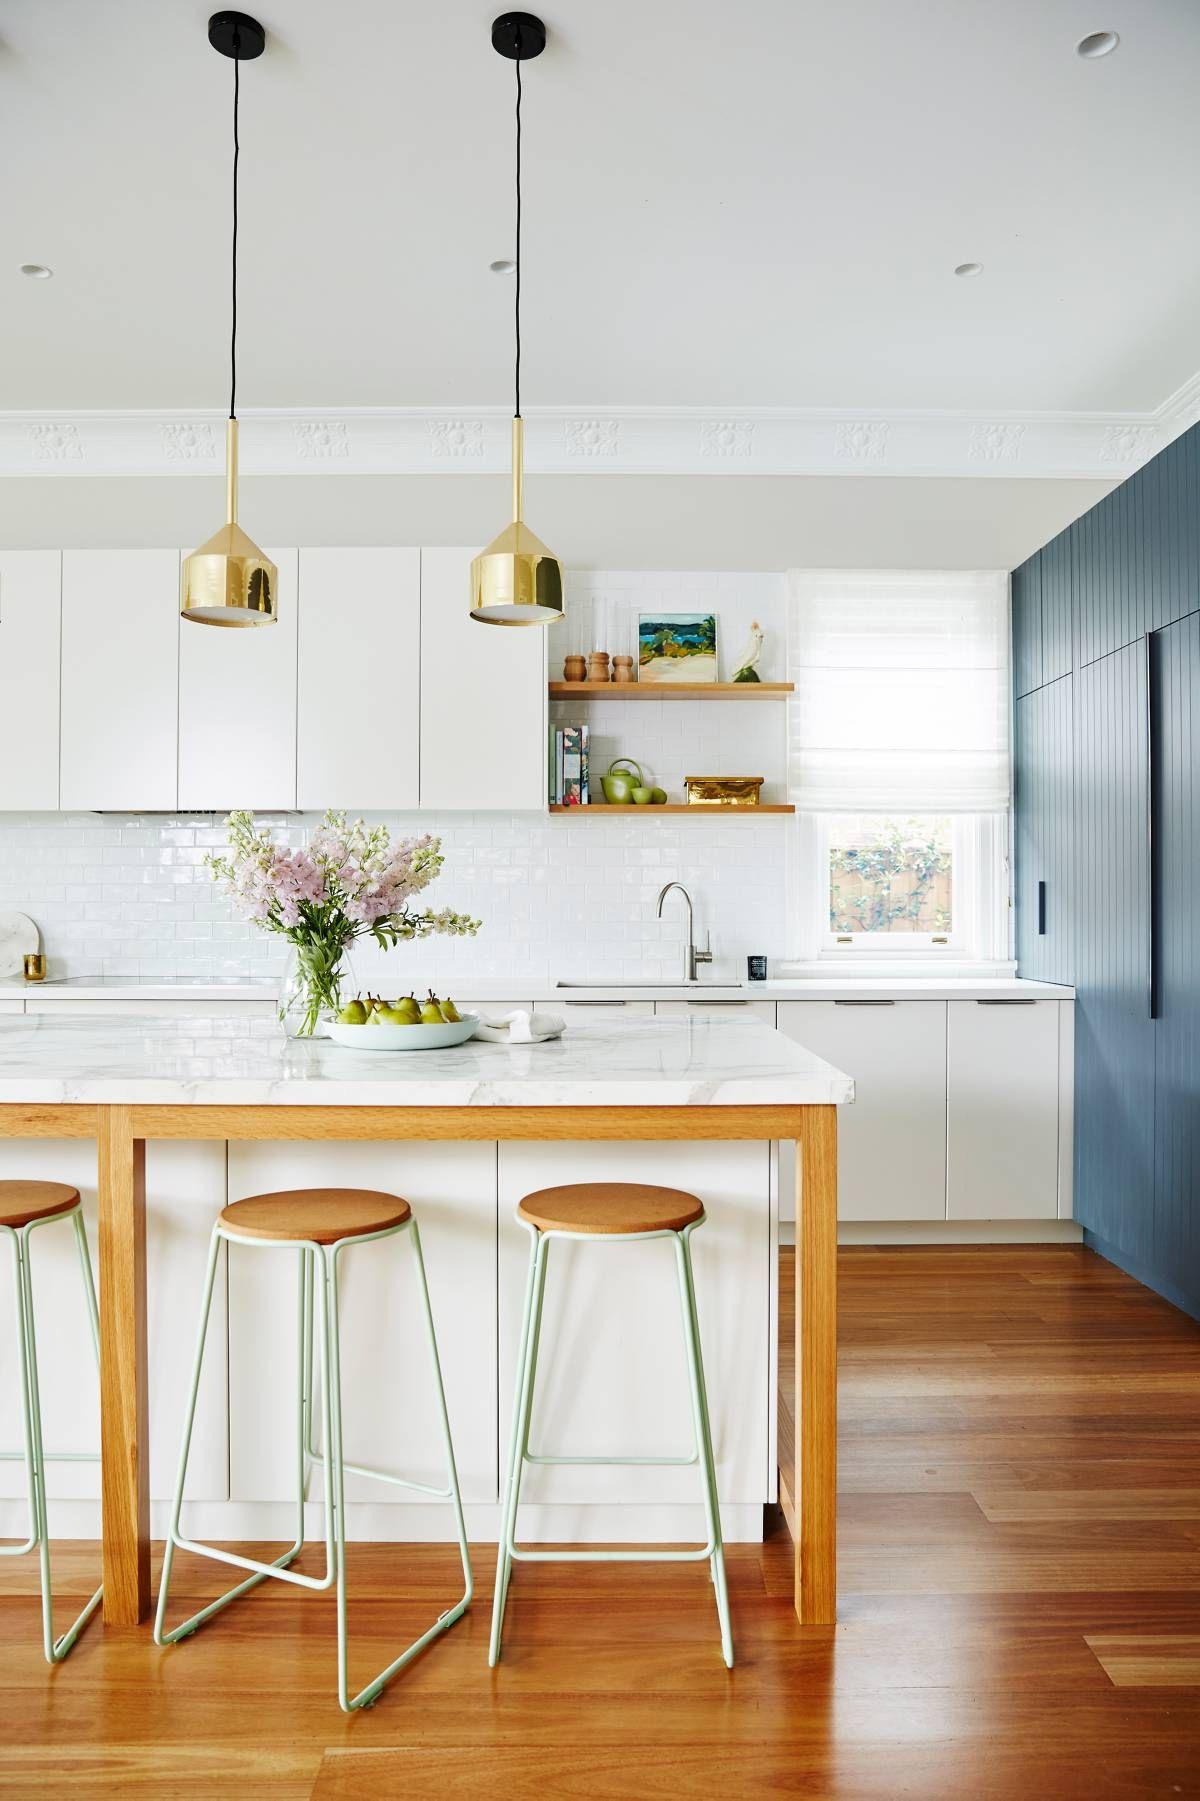 Dream kitchen makeover: Over $30,000 | Kitchens, Floating shelves ...